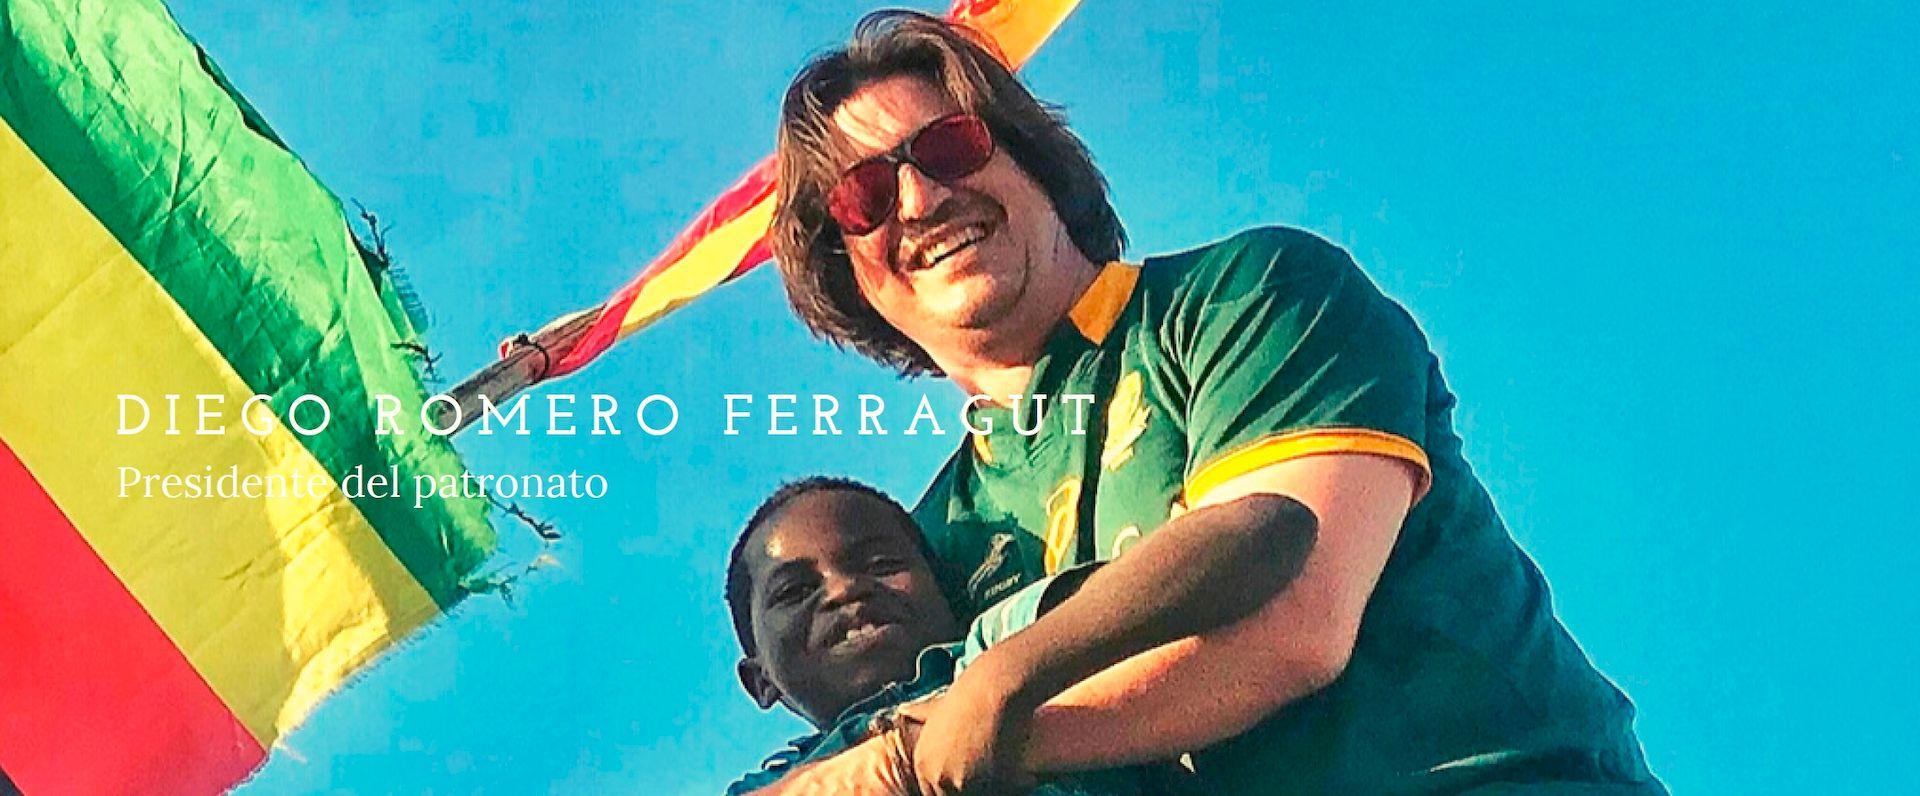 Diego Romero Ferragut presidente Smile is a Foundation